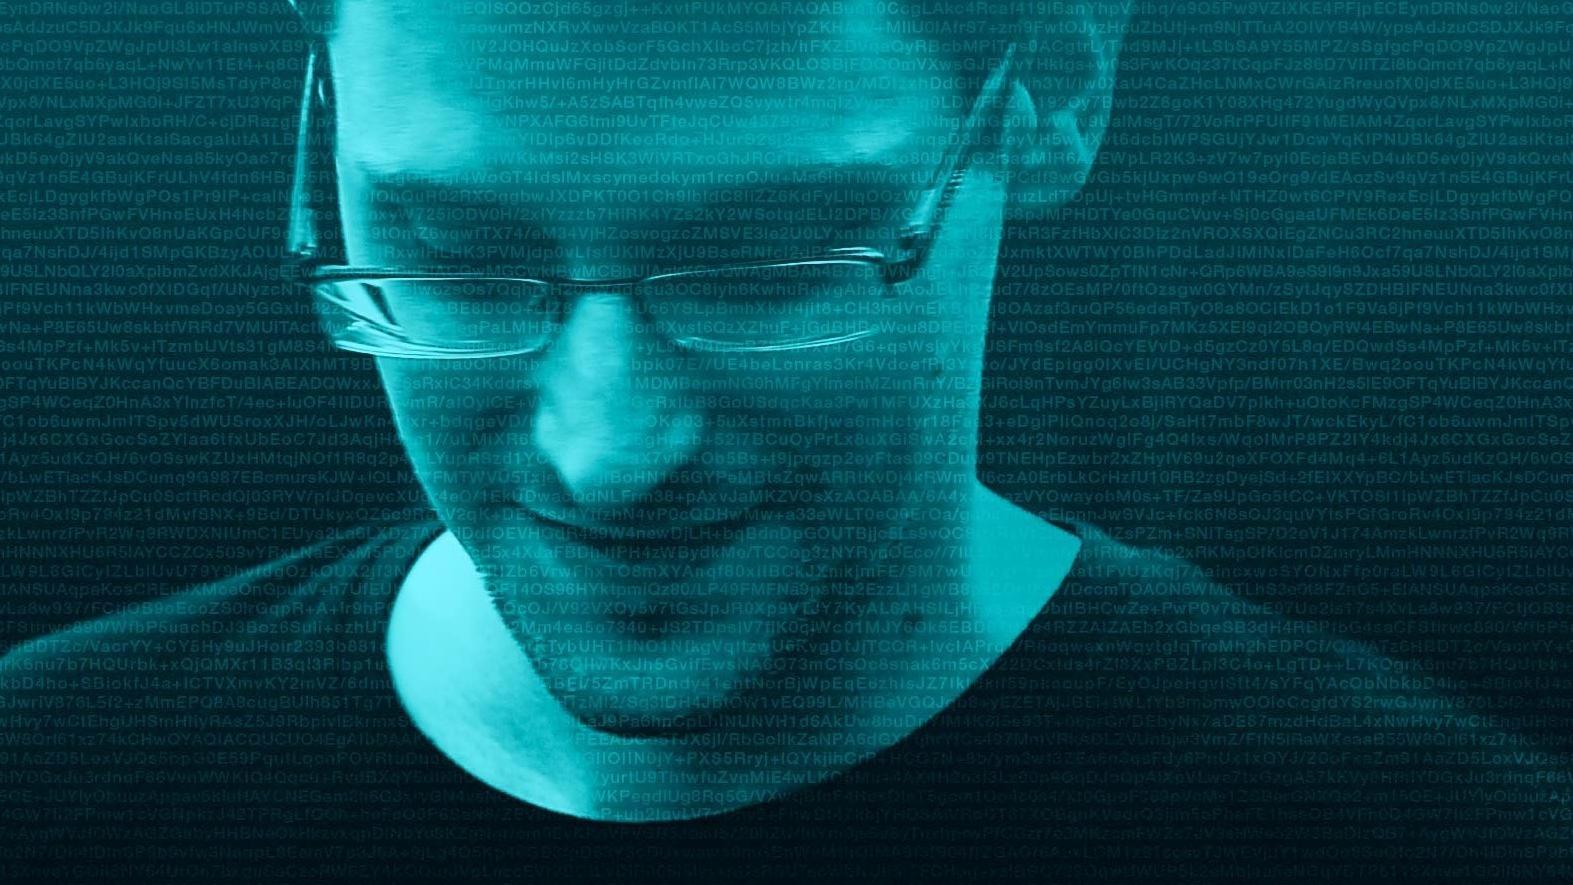 Snowden-dokumentar vant Oscar